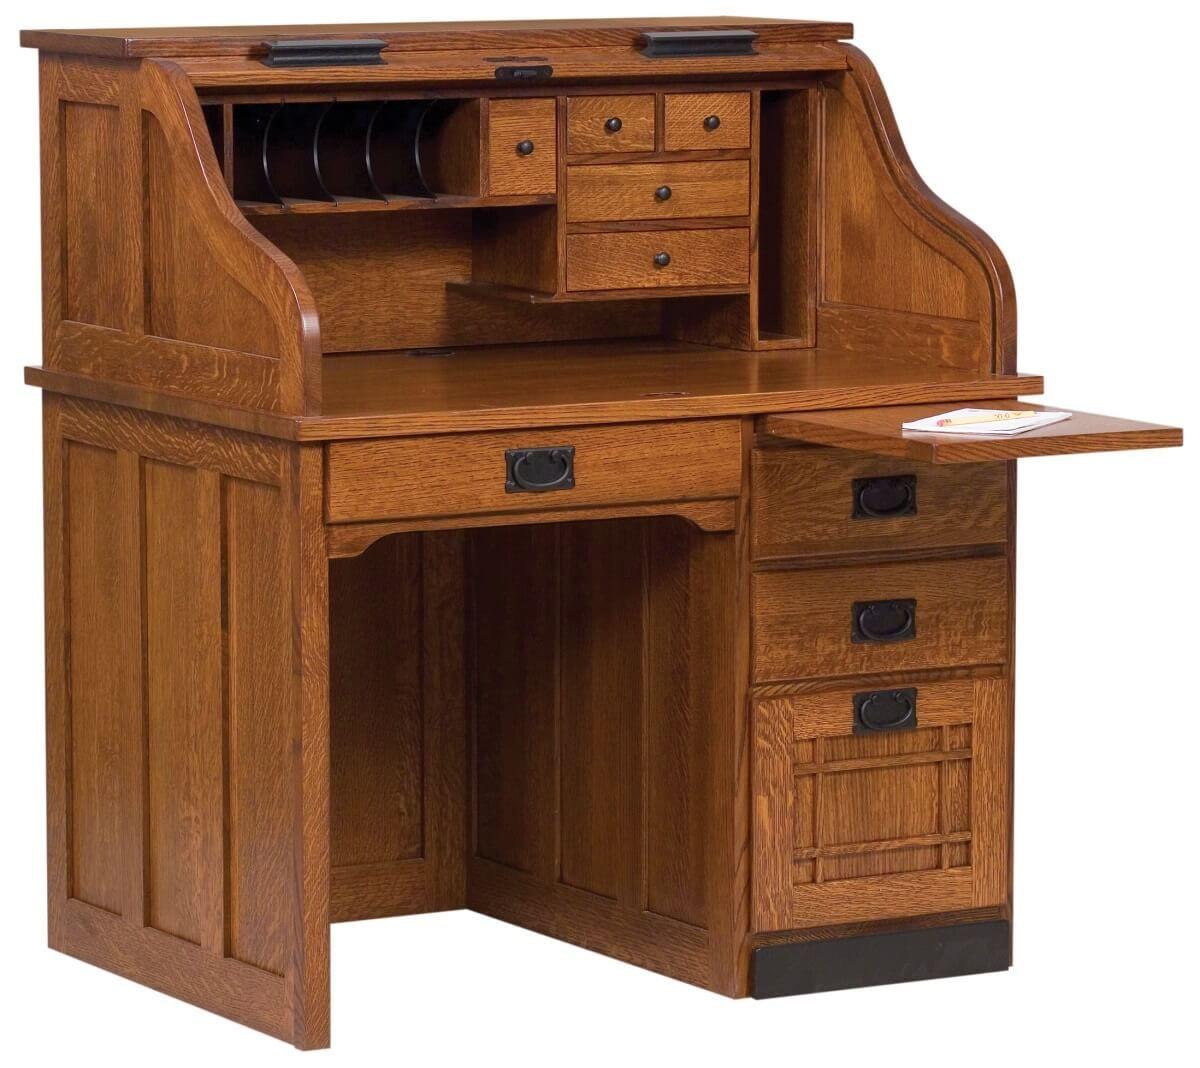 Mentor's Roll Top Desk